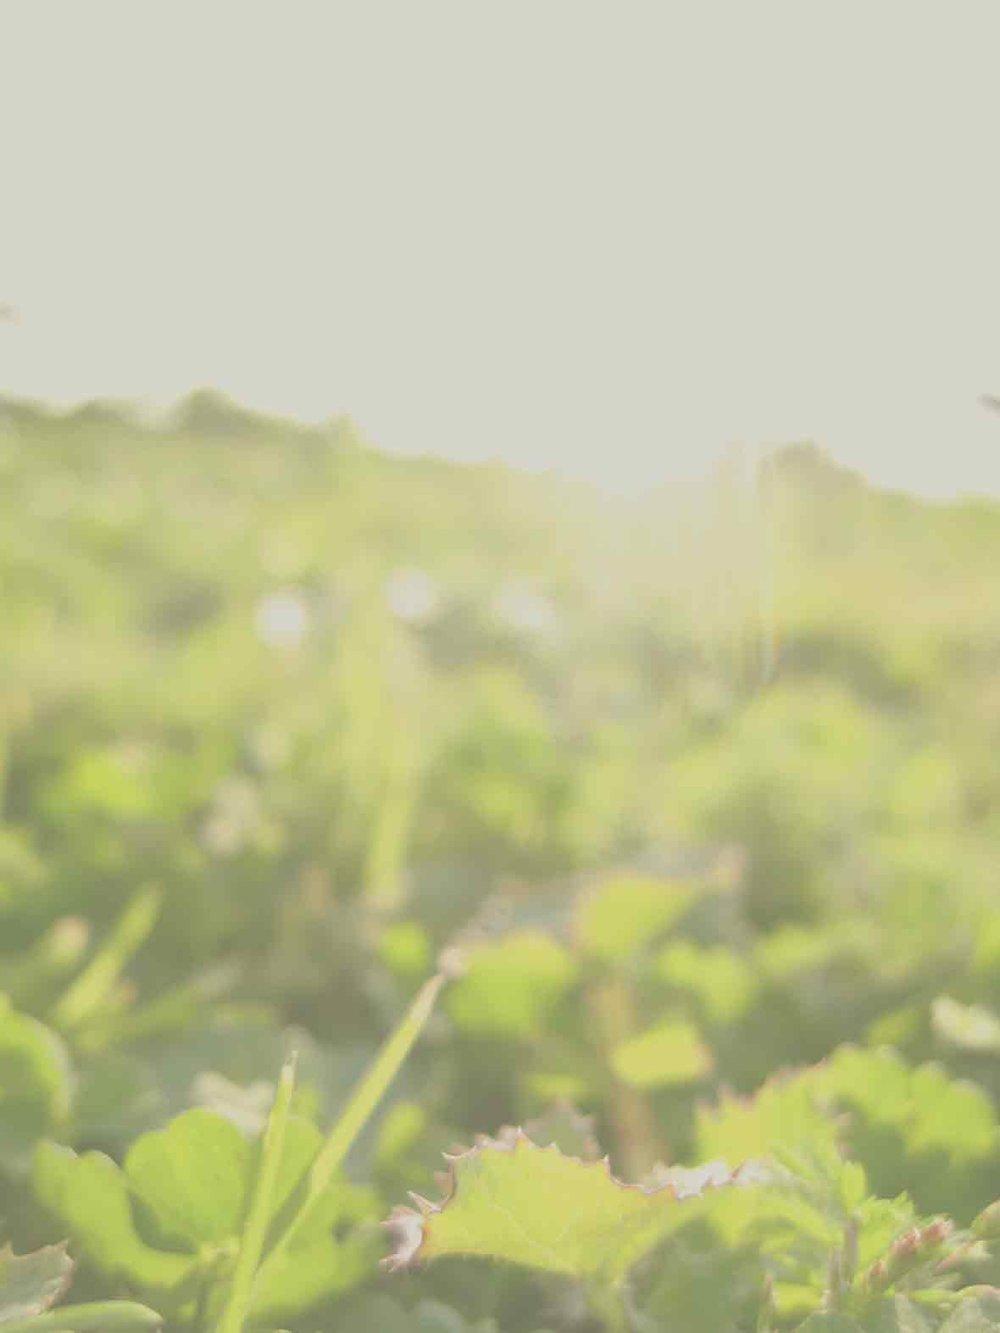 There from the beginning... - Kathi SundstromB & T FlegelMary SorensenTaz & Amir DhallaAnonymousSue BayneBrenda PullmanKris CruikshankLiz & Eldon HnylciaFrank StarrattPete & Bev MalenicaDavid & Pam KohlenbergDavid MartinLinda ChichakDave & Barb GreigKelly DevallTrent & Maureen BaisleyBen Polos Professional CorporationValerie PilsonKurt BrackmanMartine O'ConnorBernard FungPetroleum Joint Ventures AssociationHealing Bridge